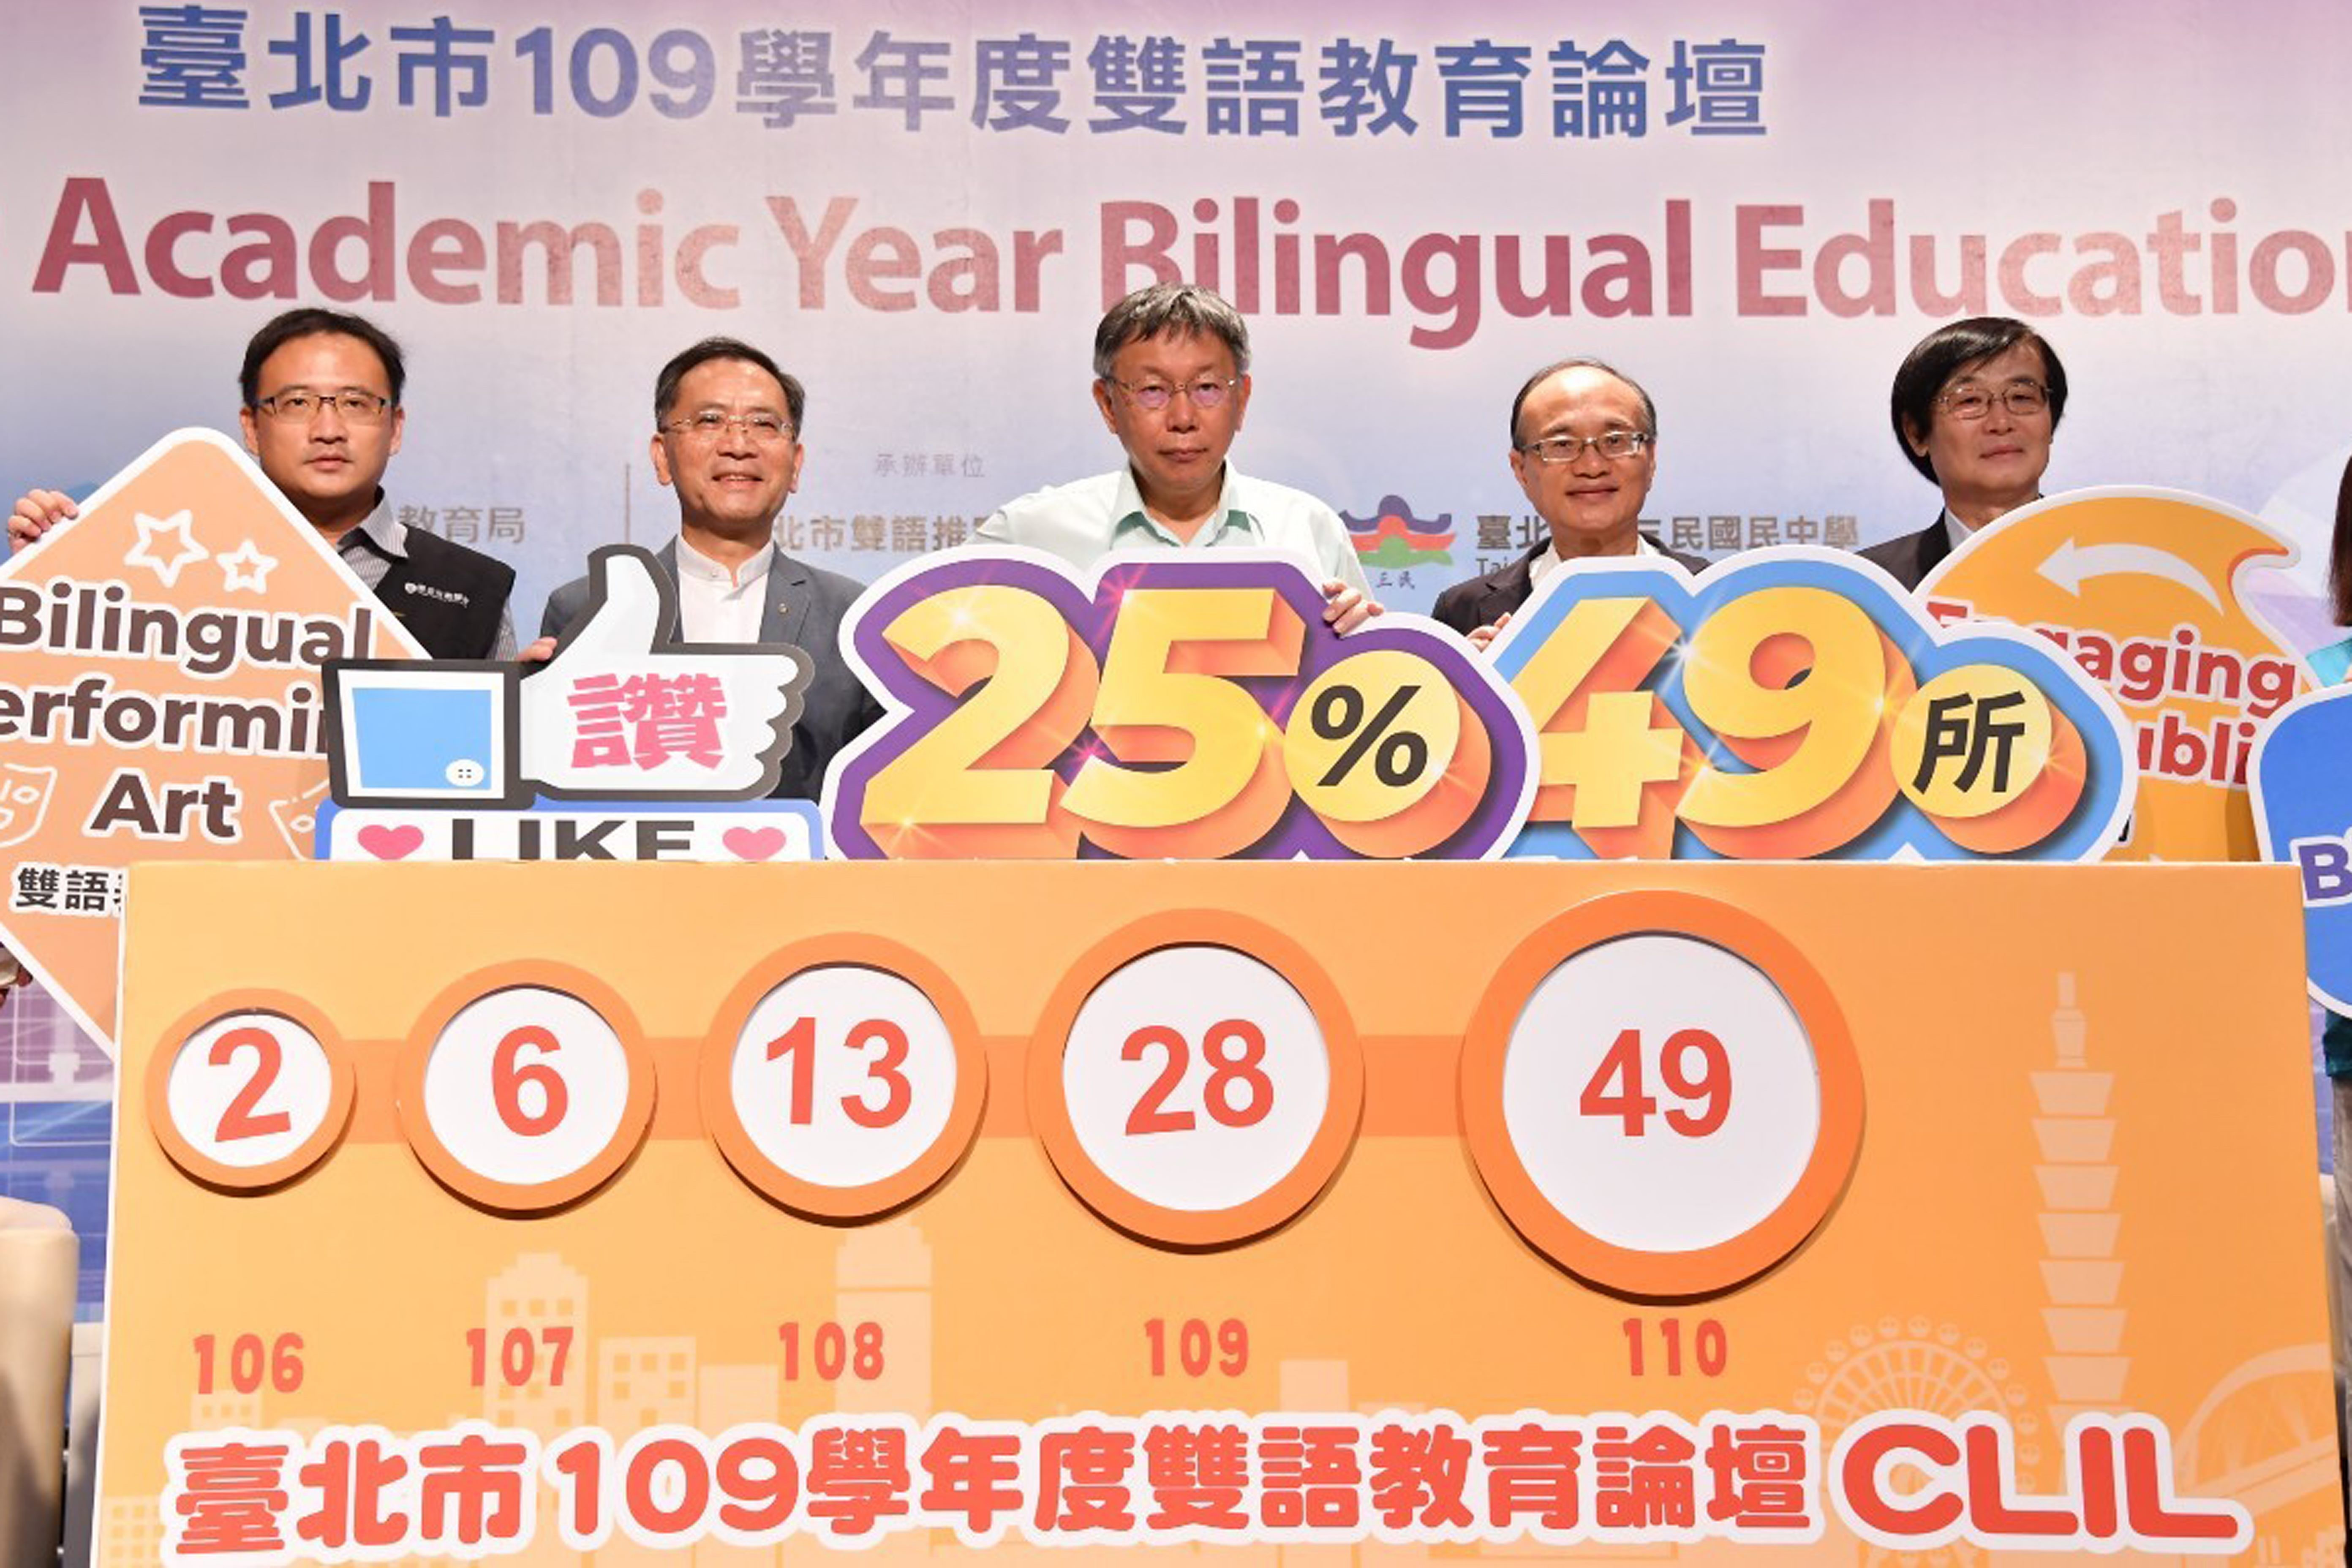 Mayor Ko attending the Bilingual Education Forum